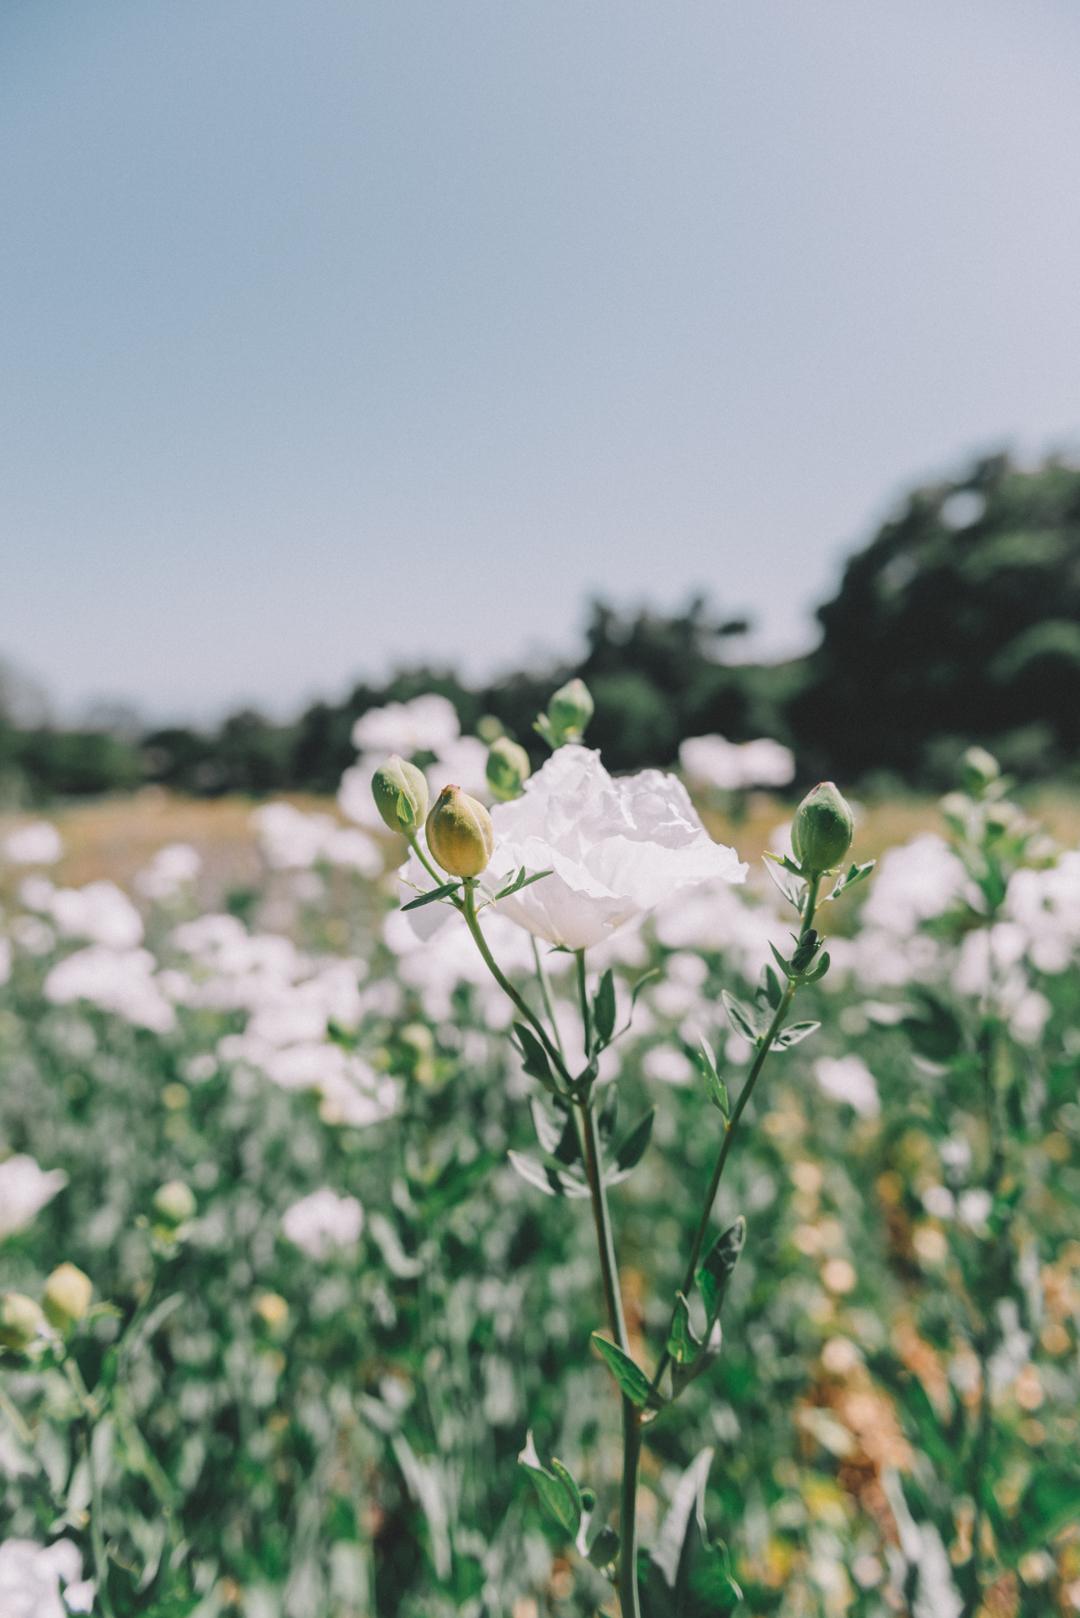 5. Hike at the Botanic Garden - A Historic Landmark